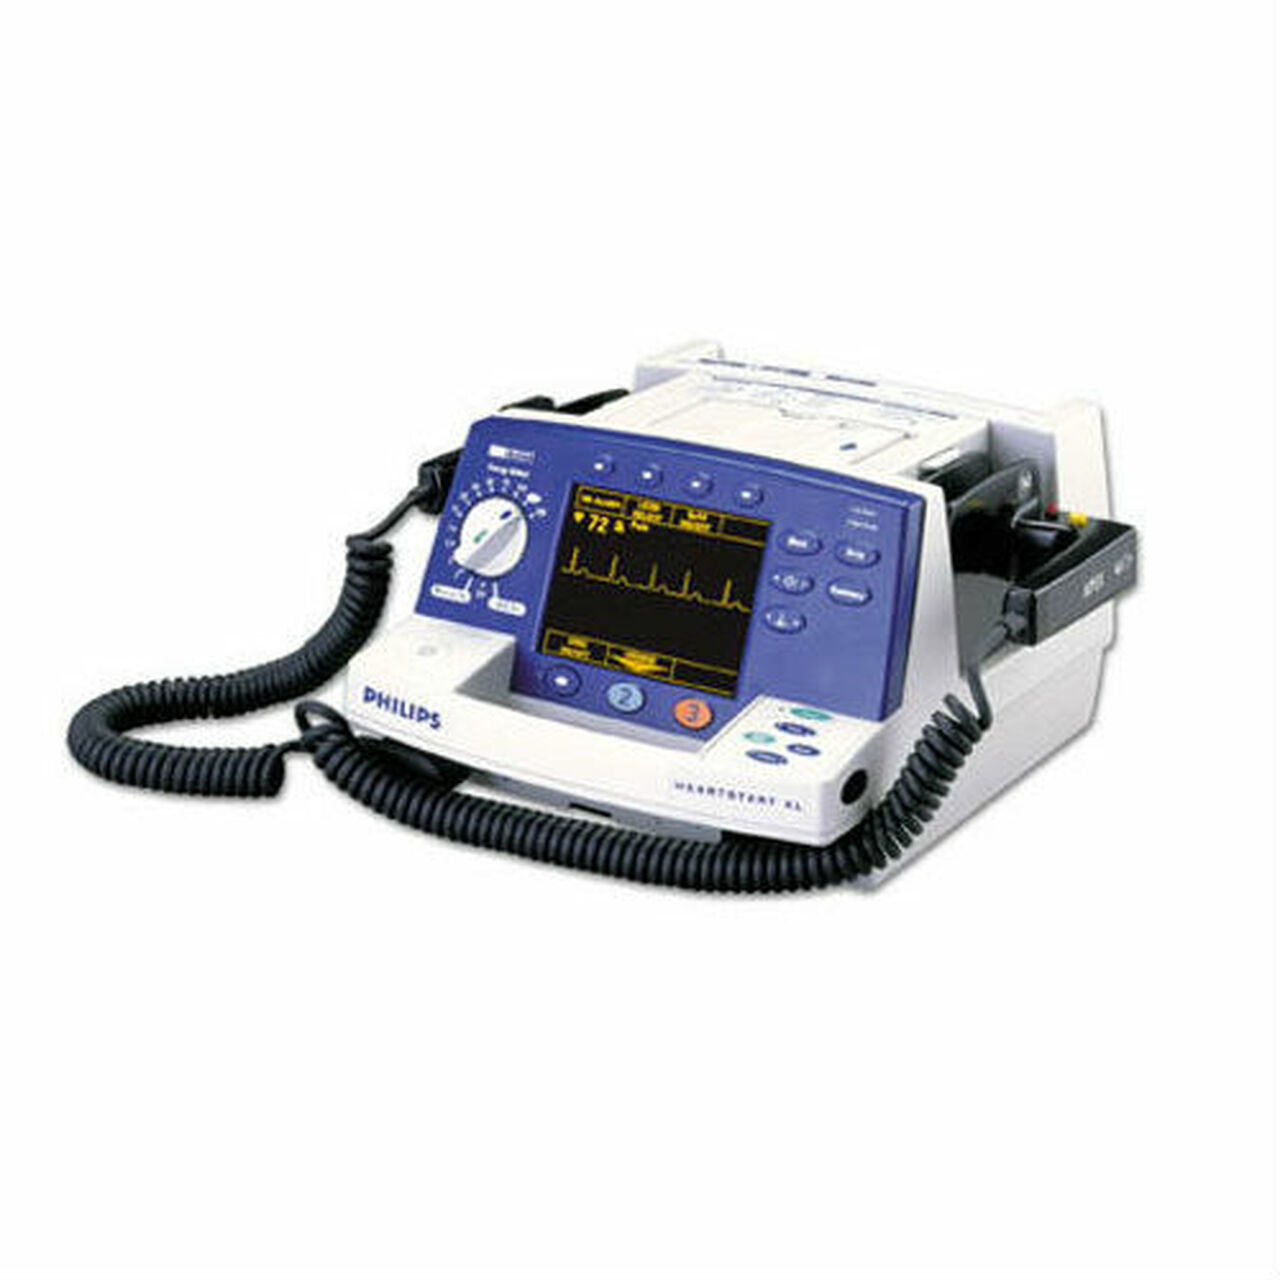 Philips Heartstart XL Monitor Defibrillator